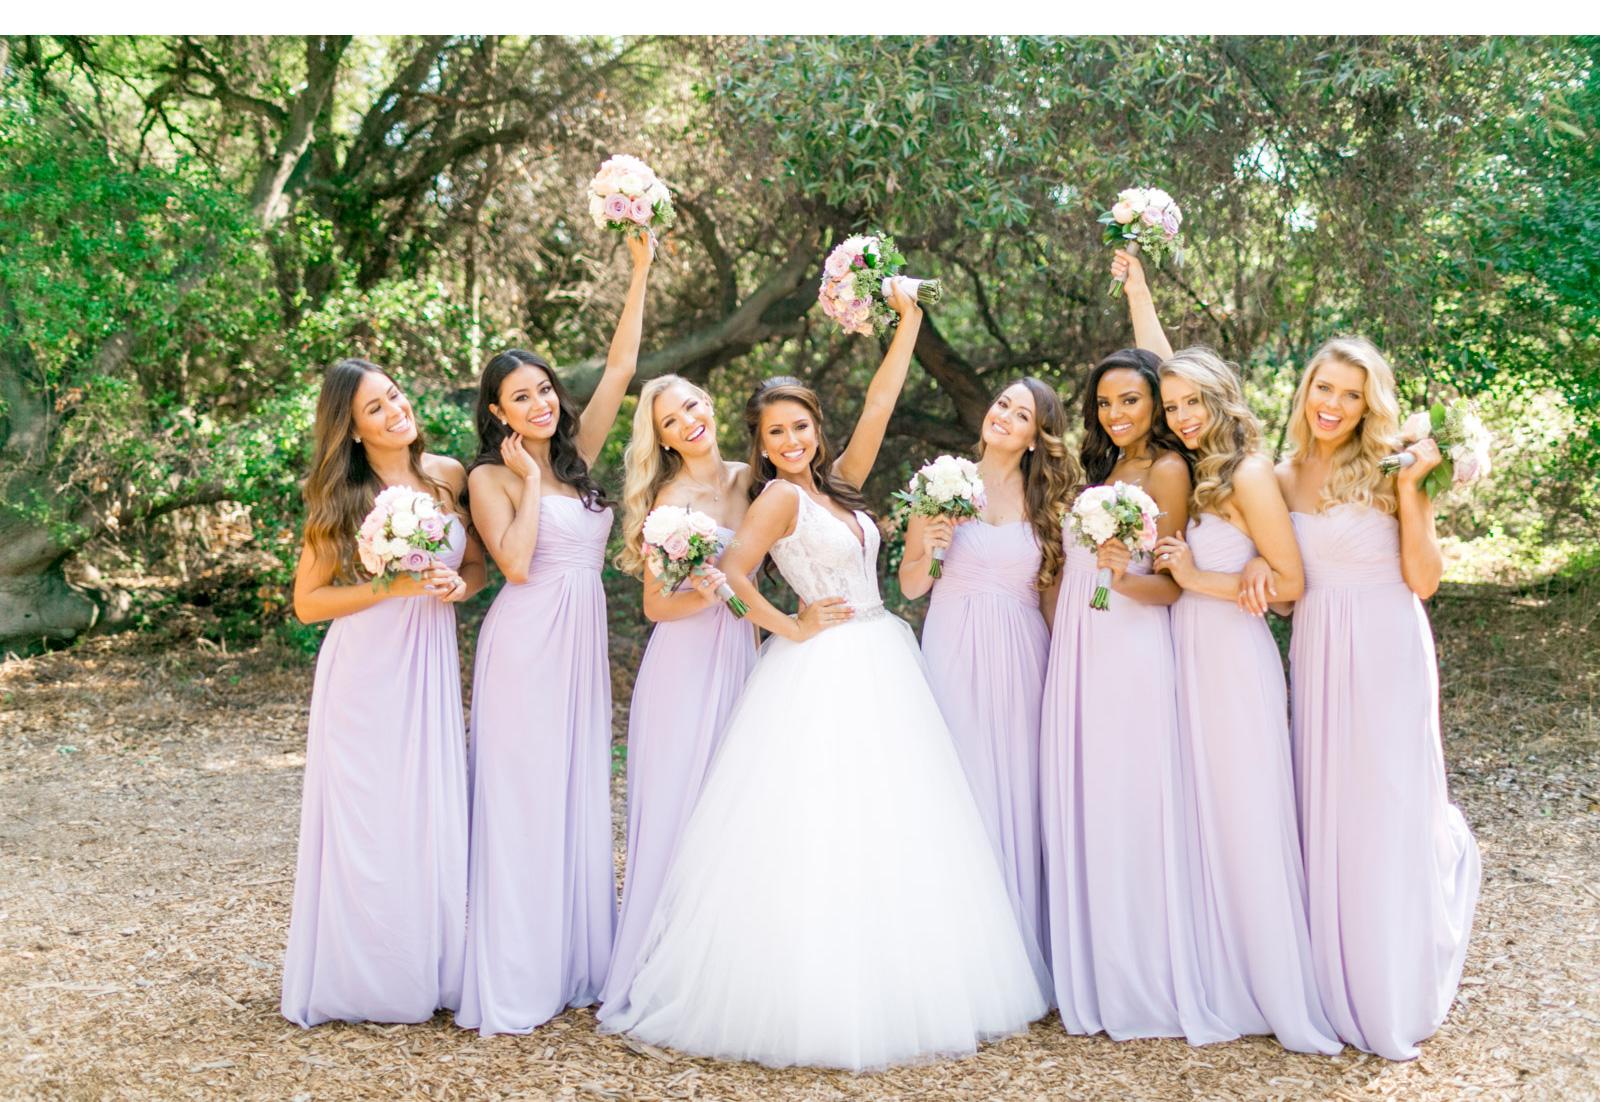 Miss-USA-Temecula-Wedding-Natalie-Schutt-Photography_06.jpg